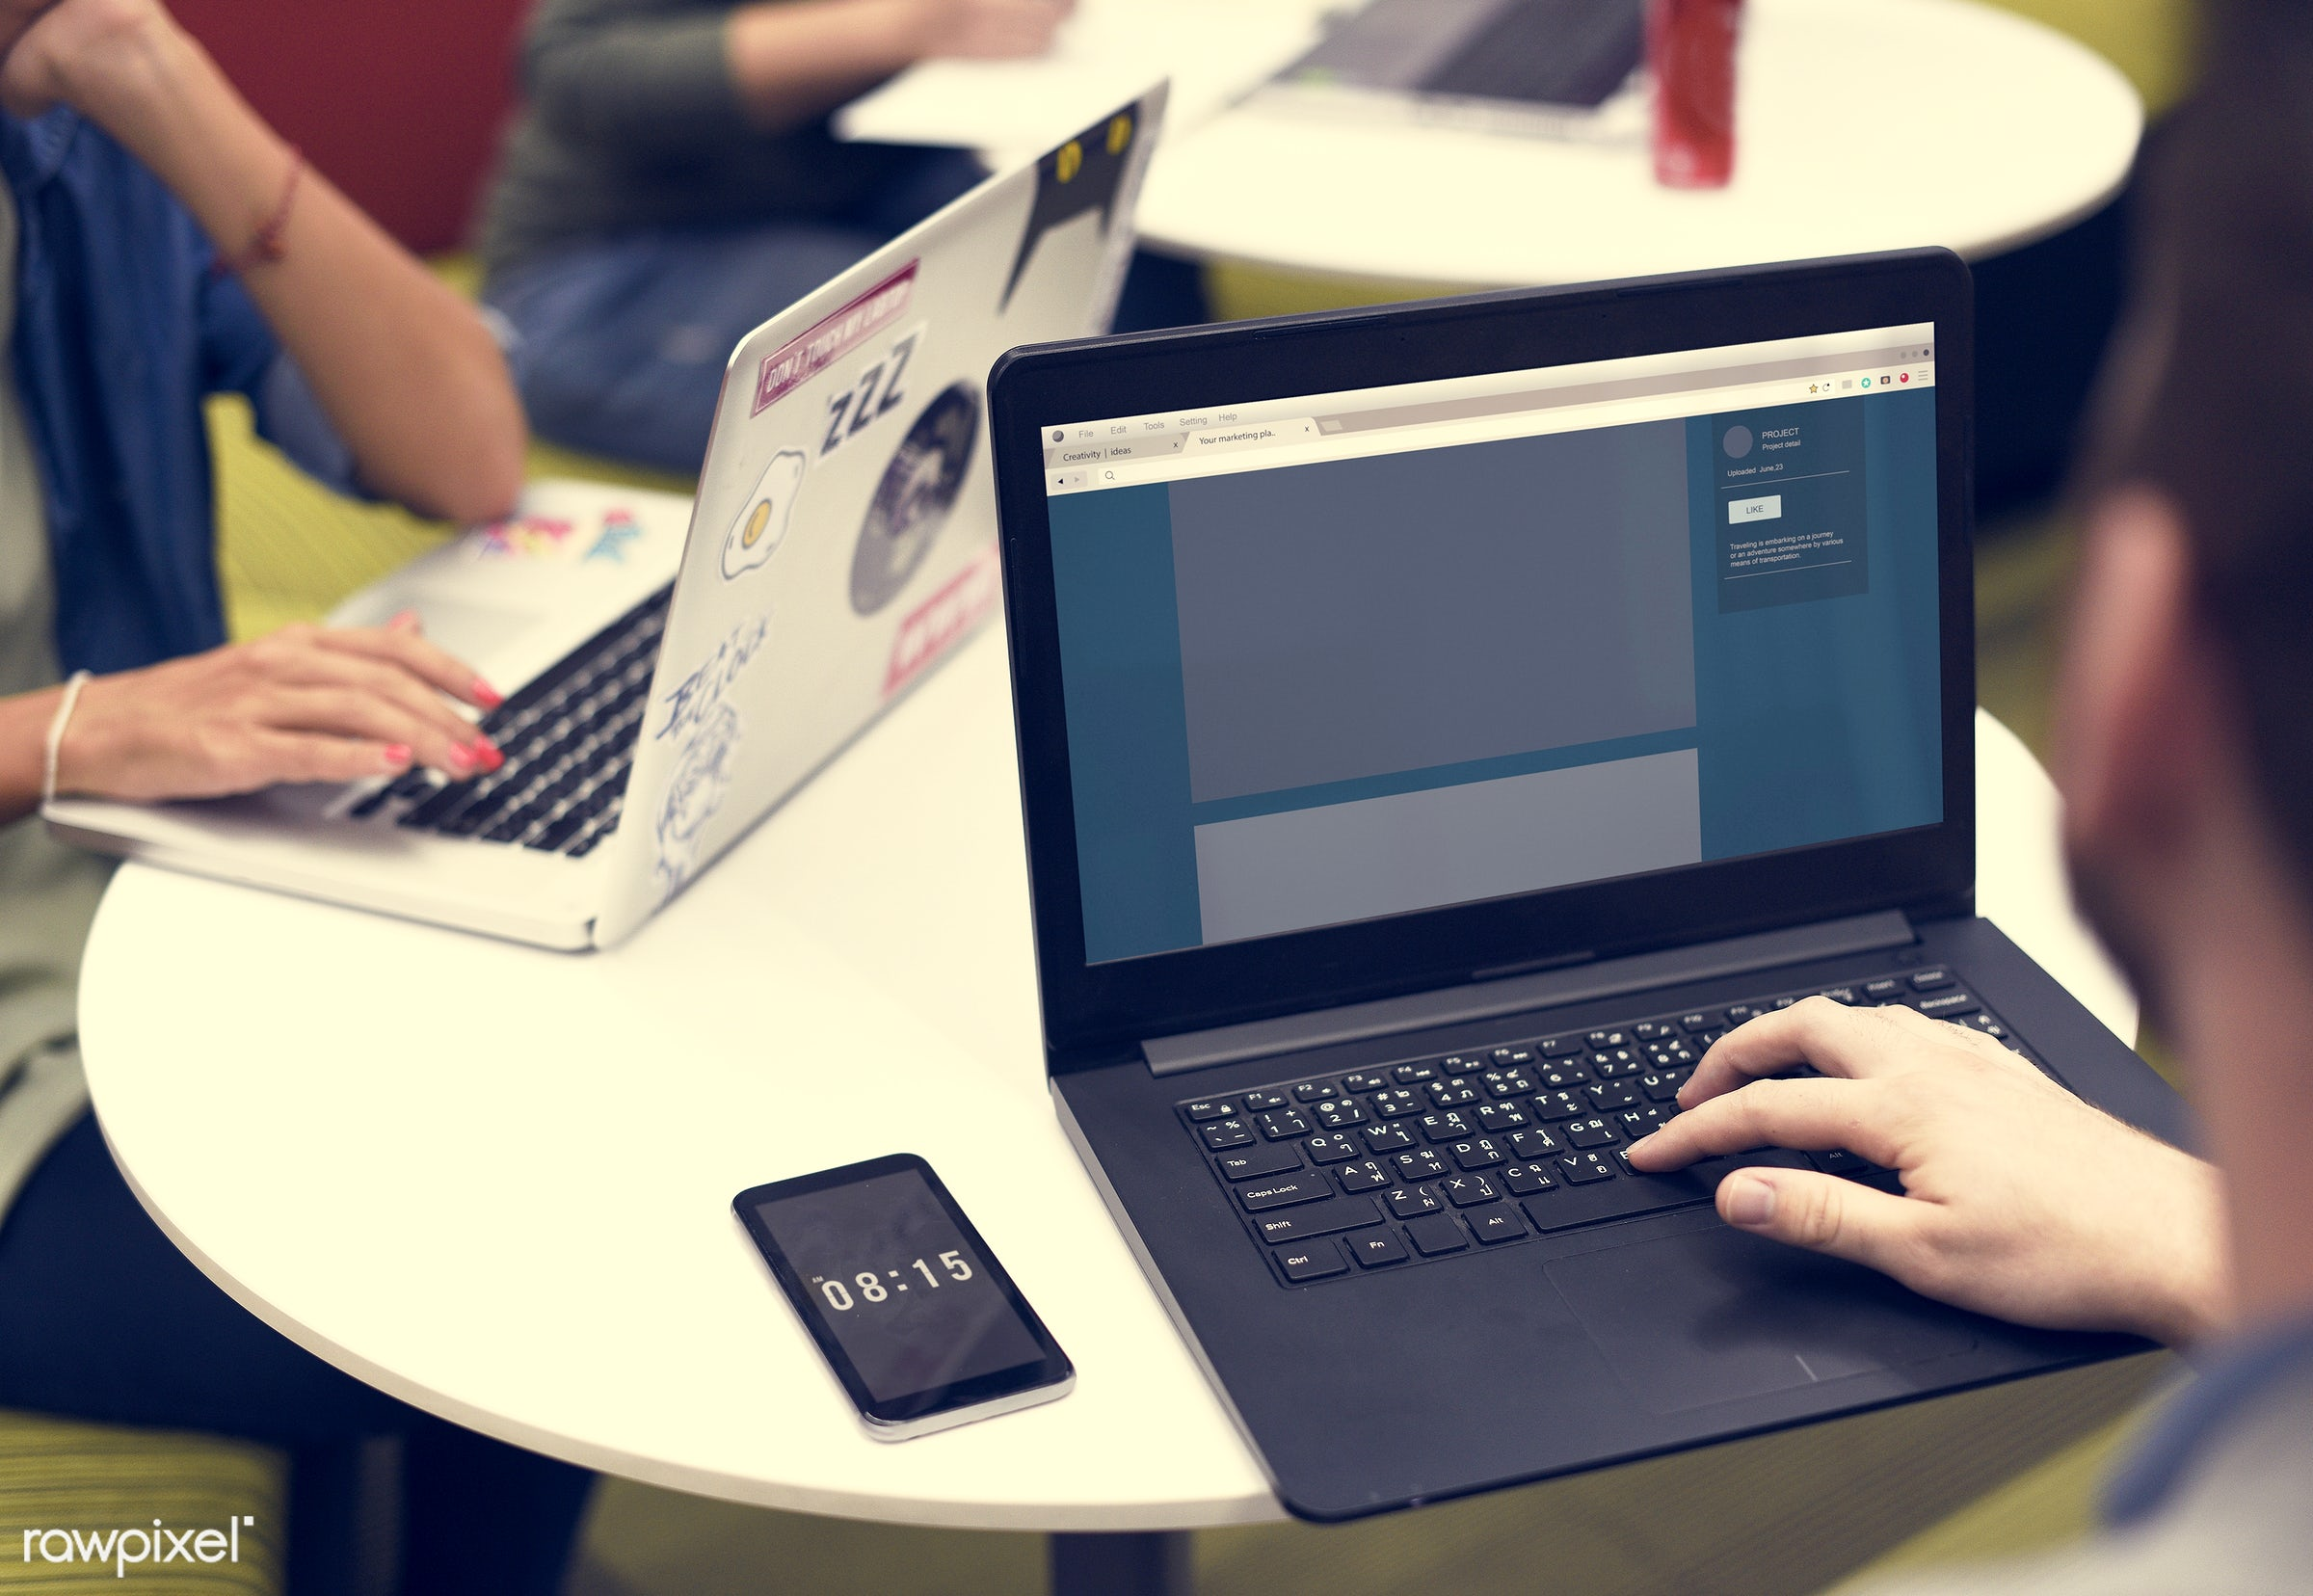 brainstorm, cellphone, colleagues, computer, creative, device, digital, digital device, hands, ideas, laptop, lifestyle,...